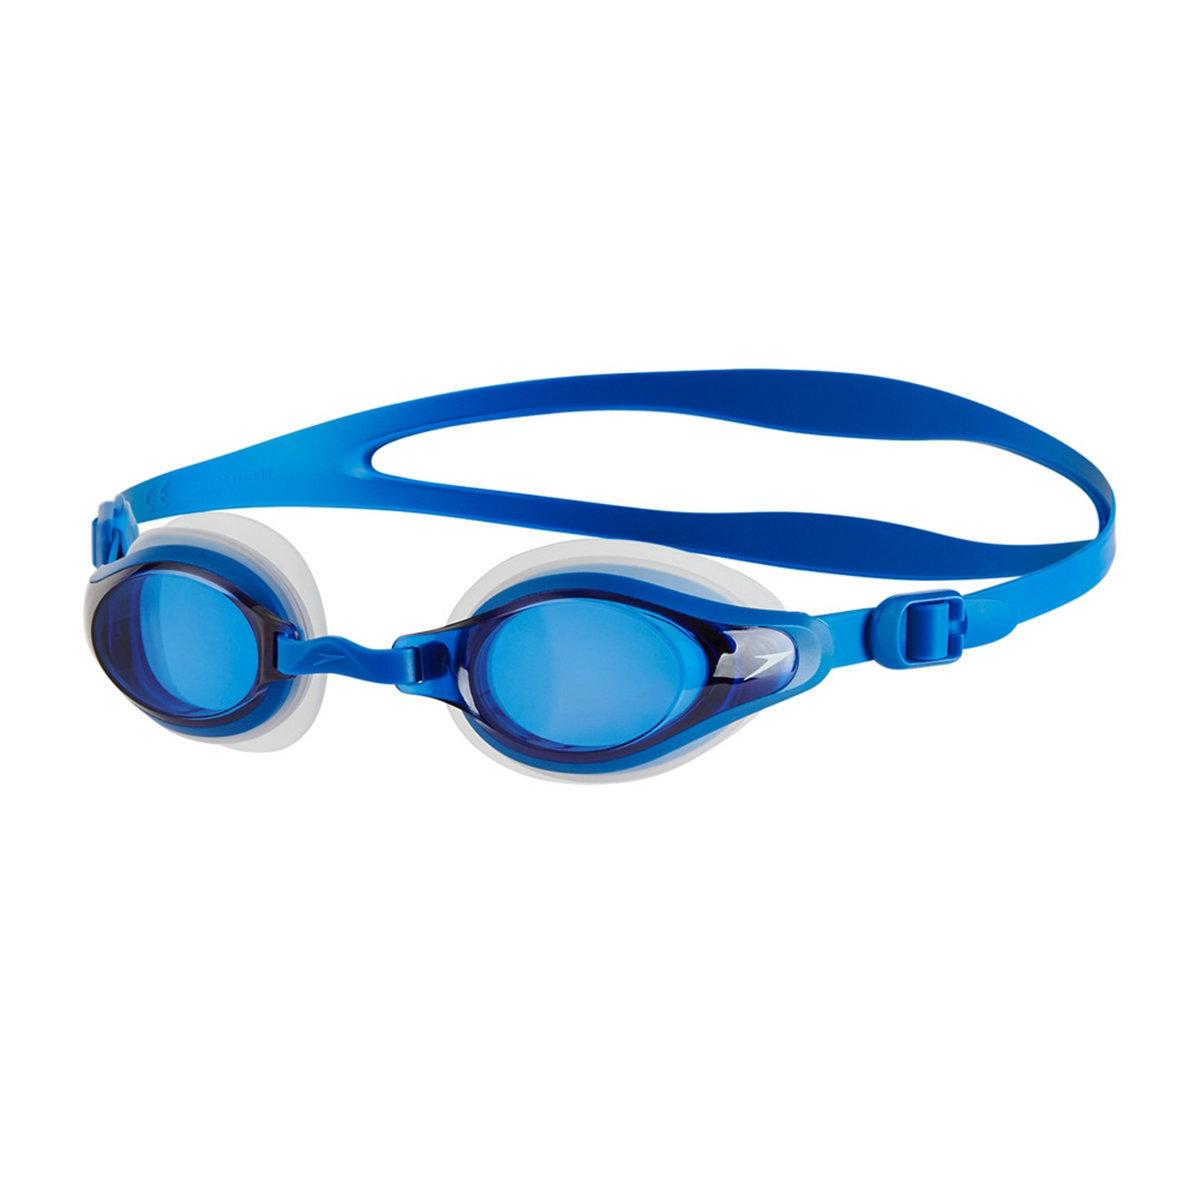 成人 Mariner Supreme 基礎訓練近視泳鏡-透明 / 藍